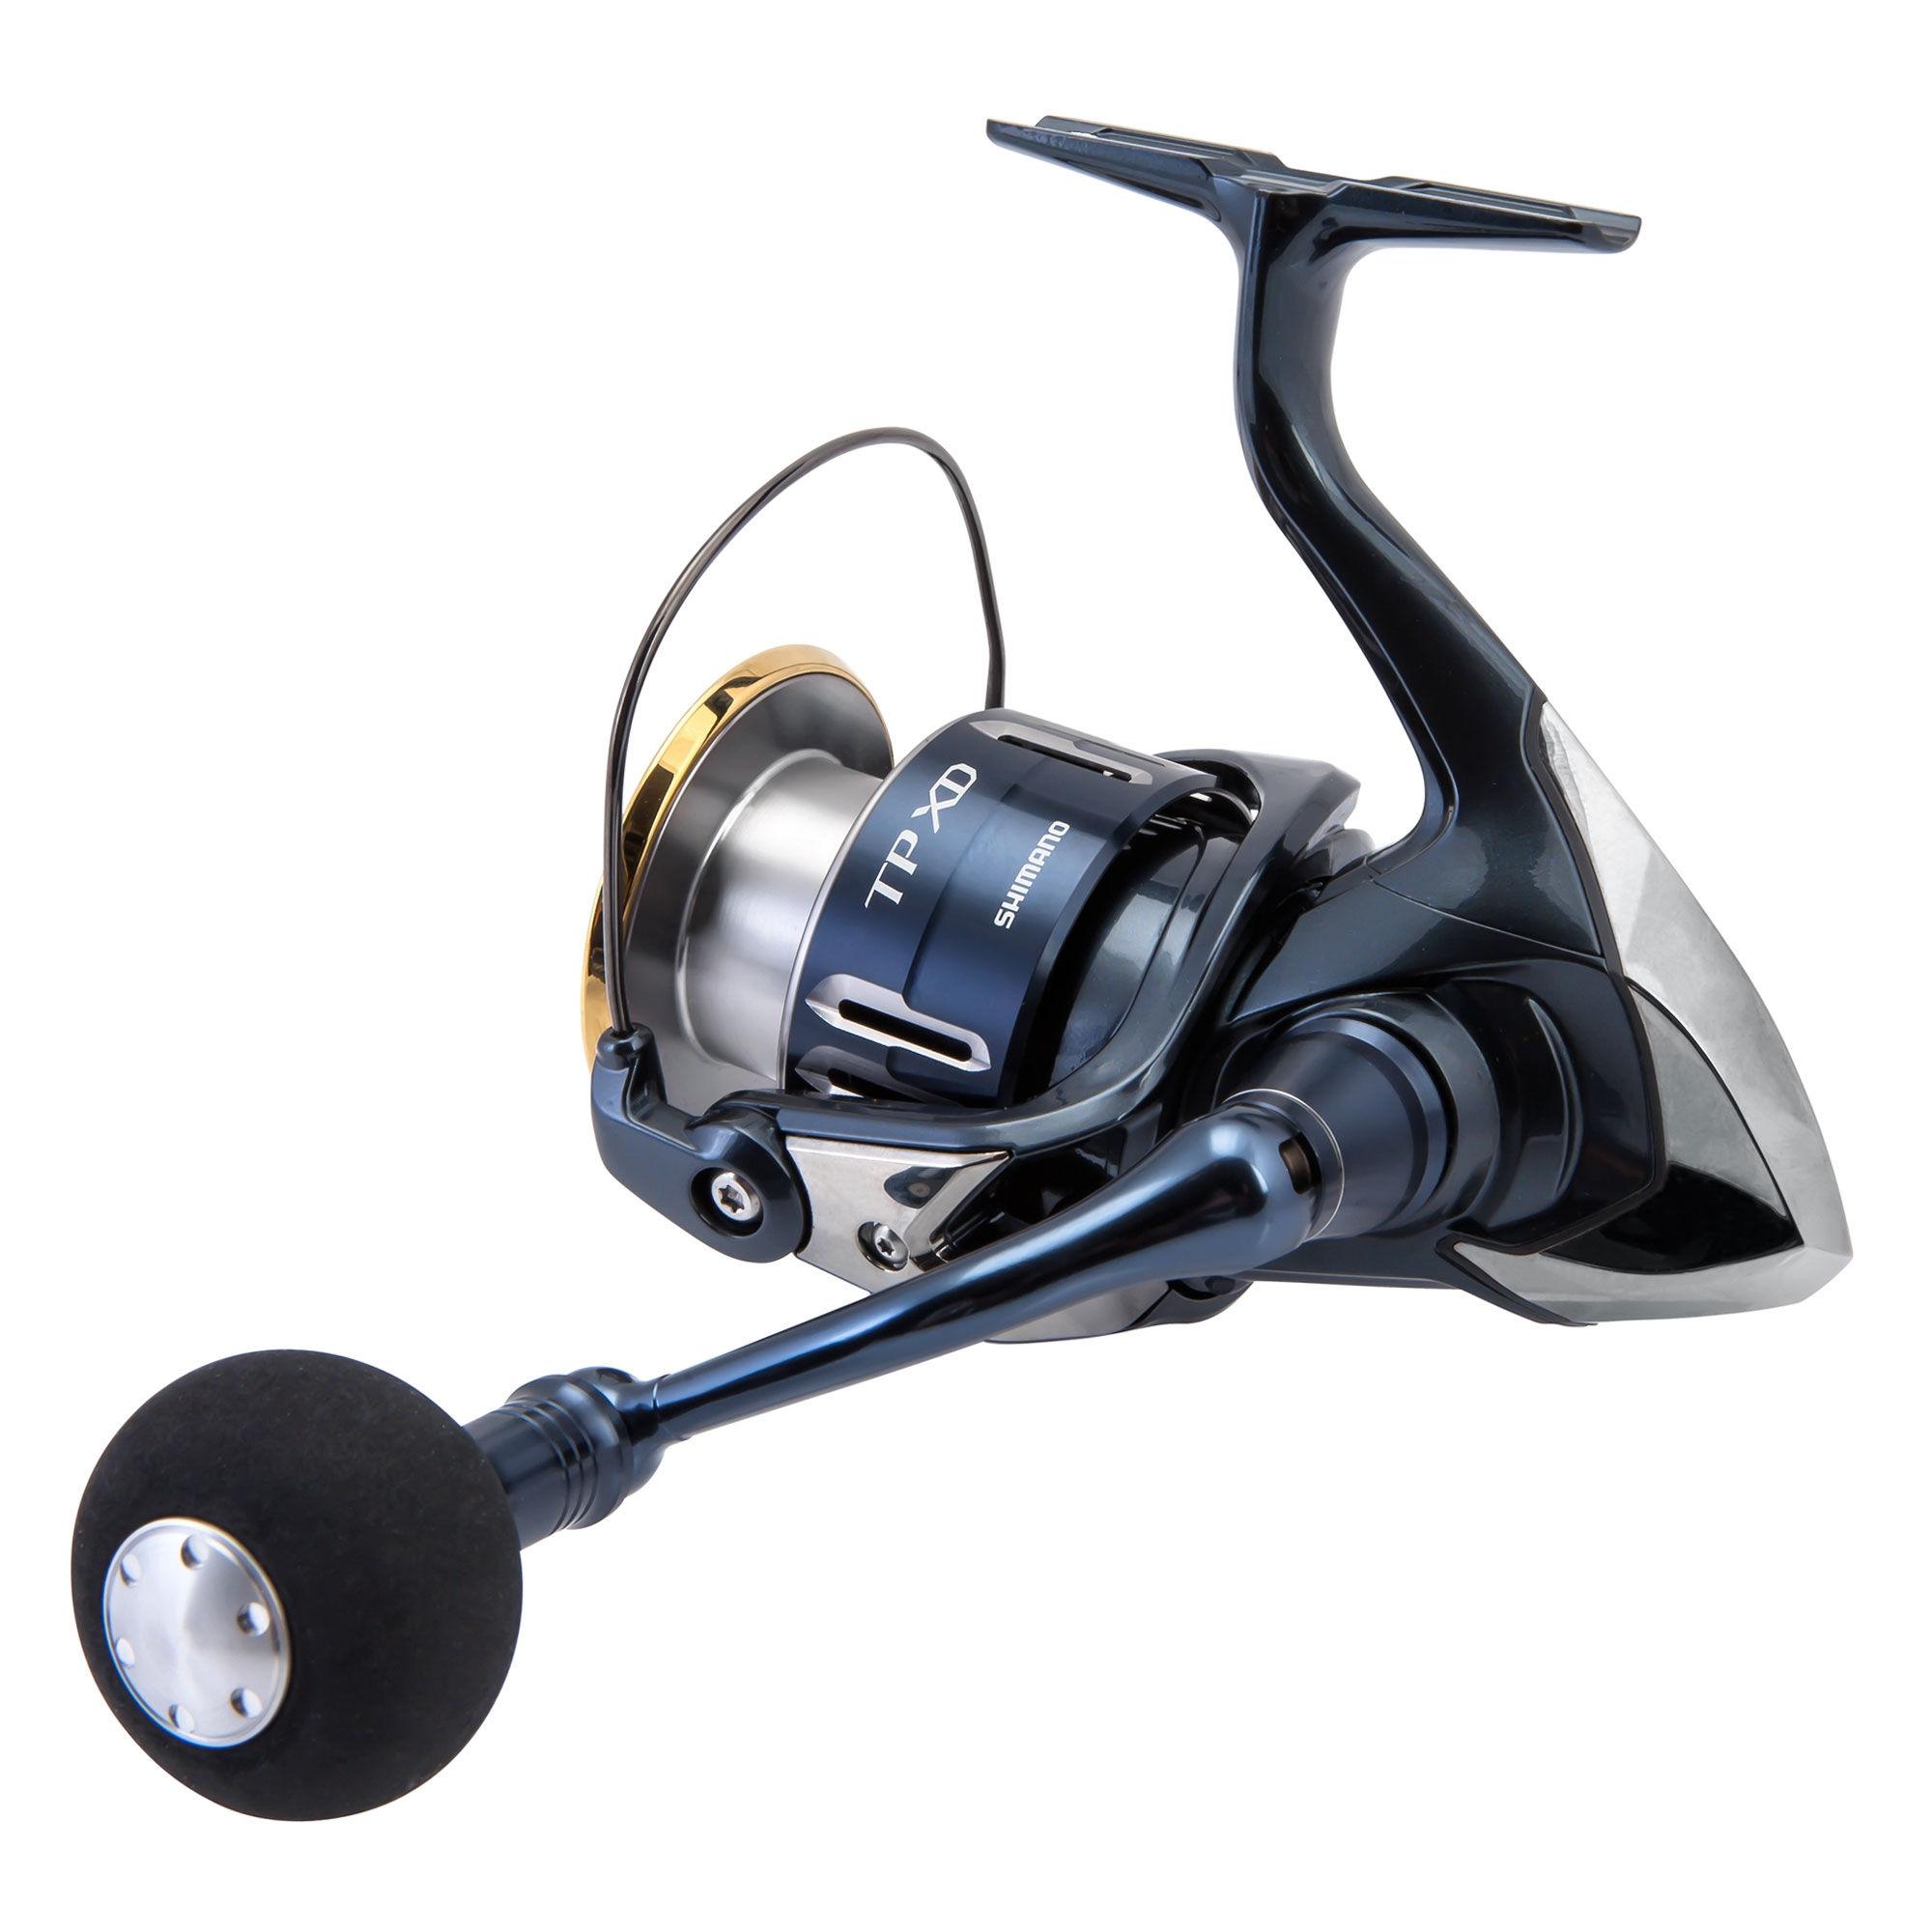 Carreto Shimano Twinpower XD - Pesca Barrento